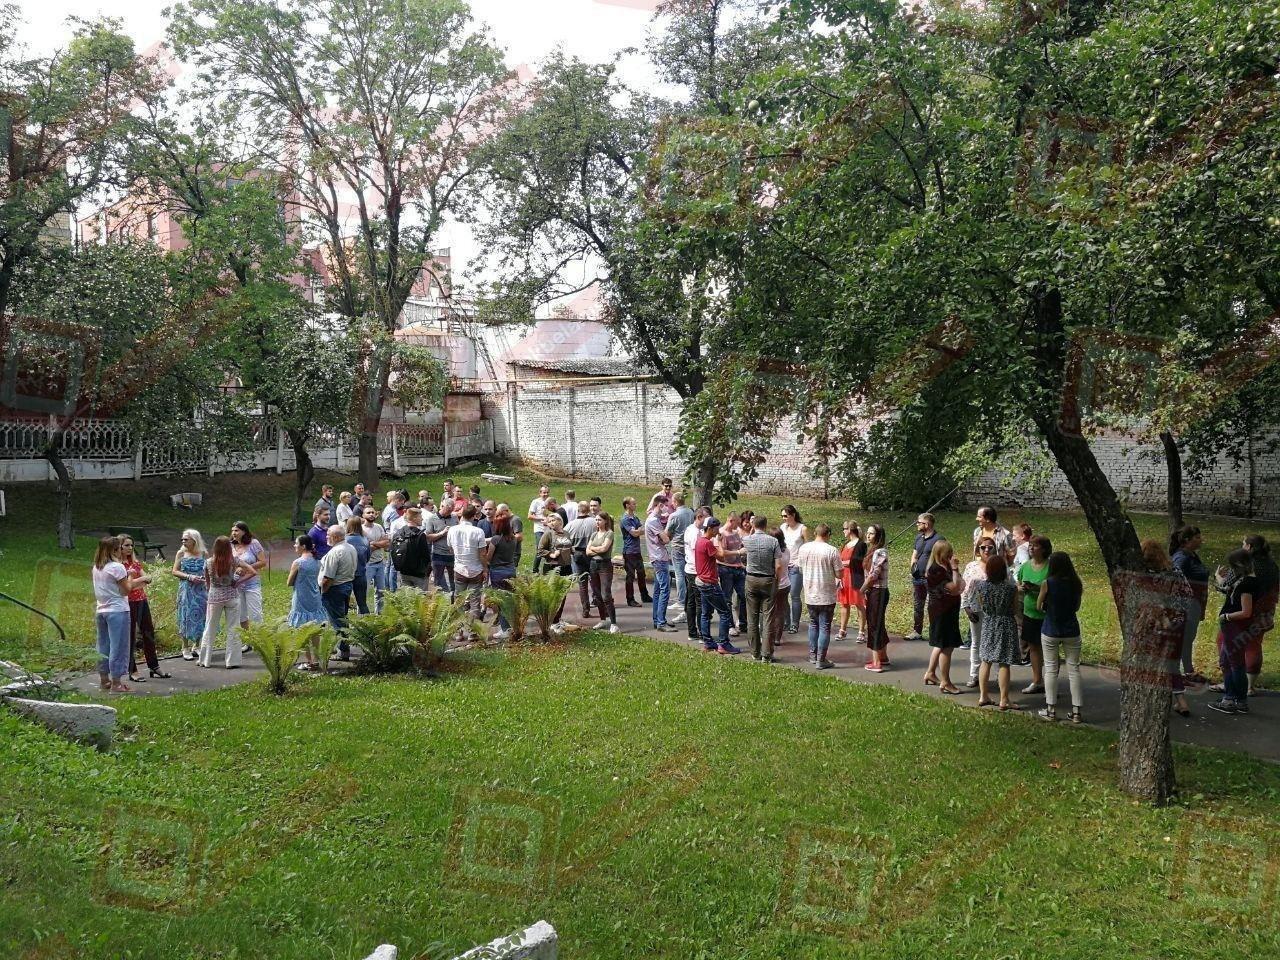 Забастовка рабочих в Беларуси